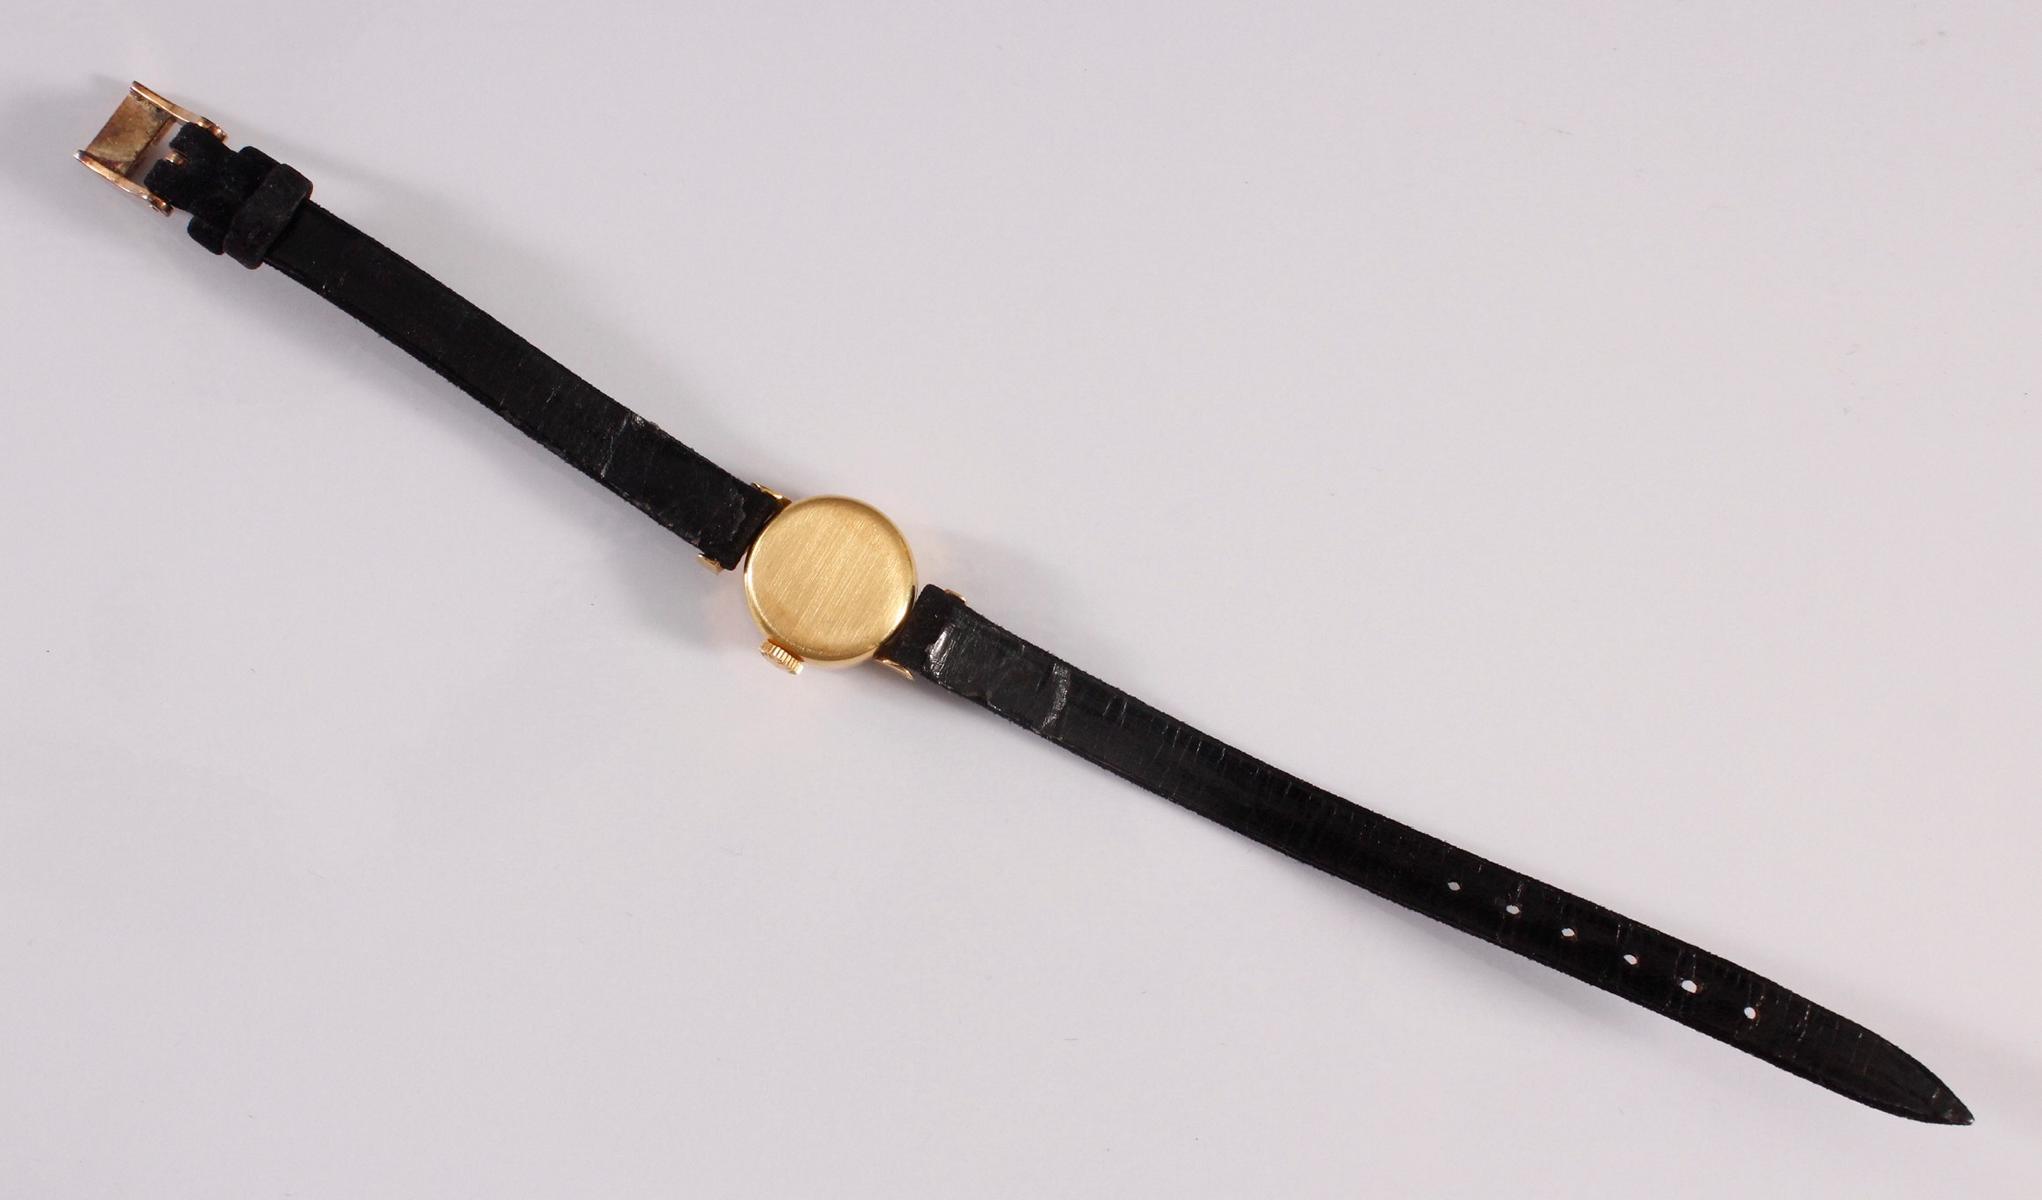 Longine Damenarmbanduhr, 18 Karat Gelbgold-4